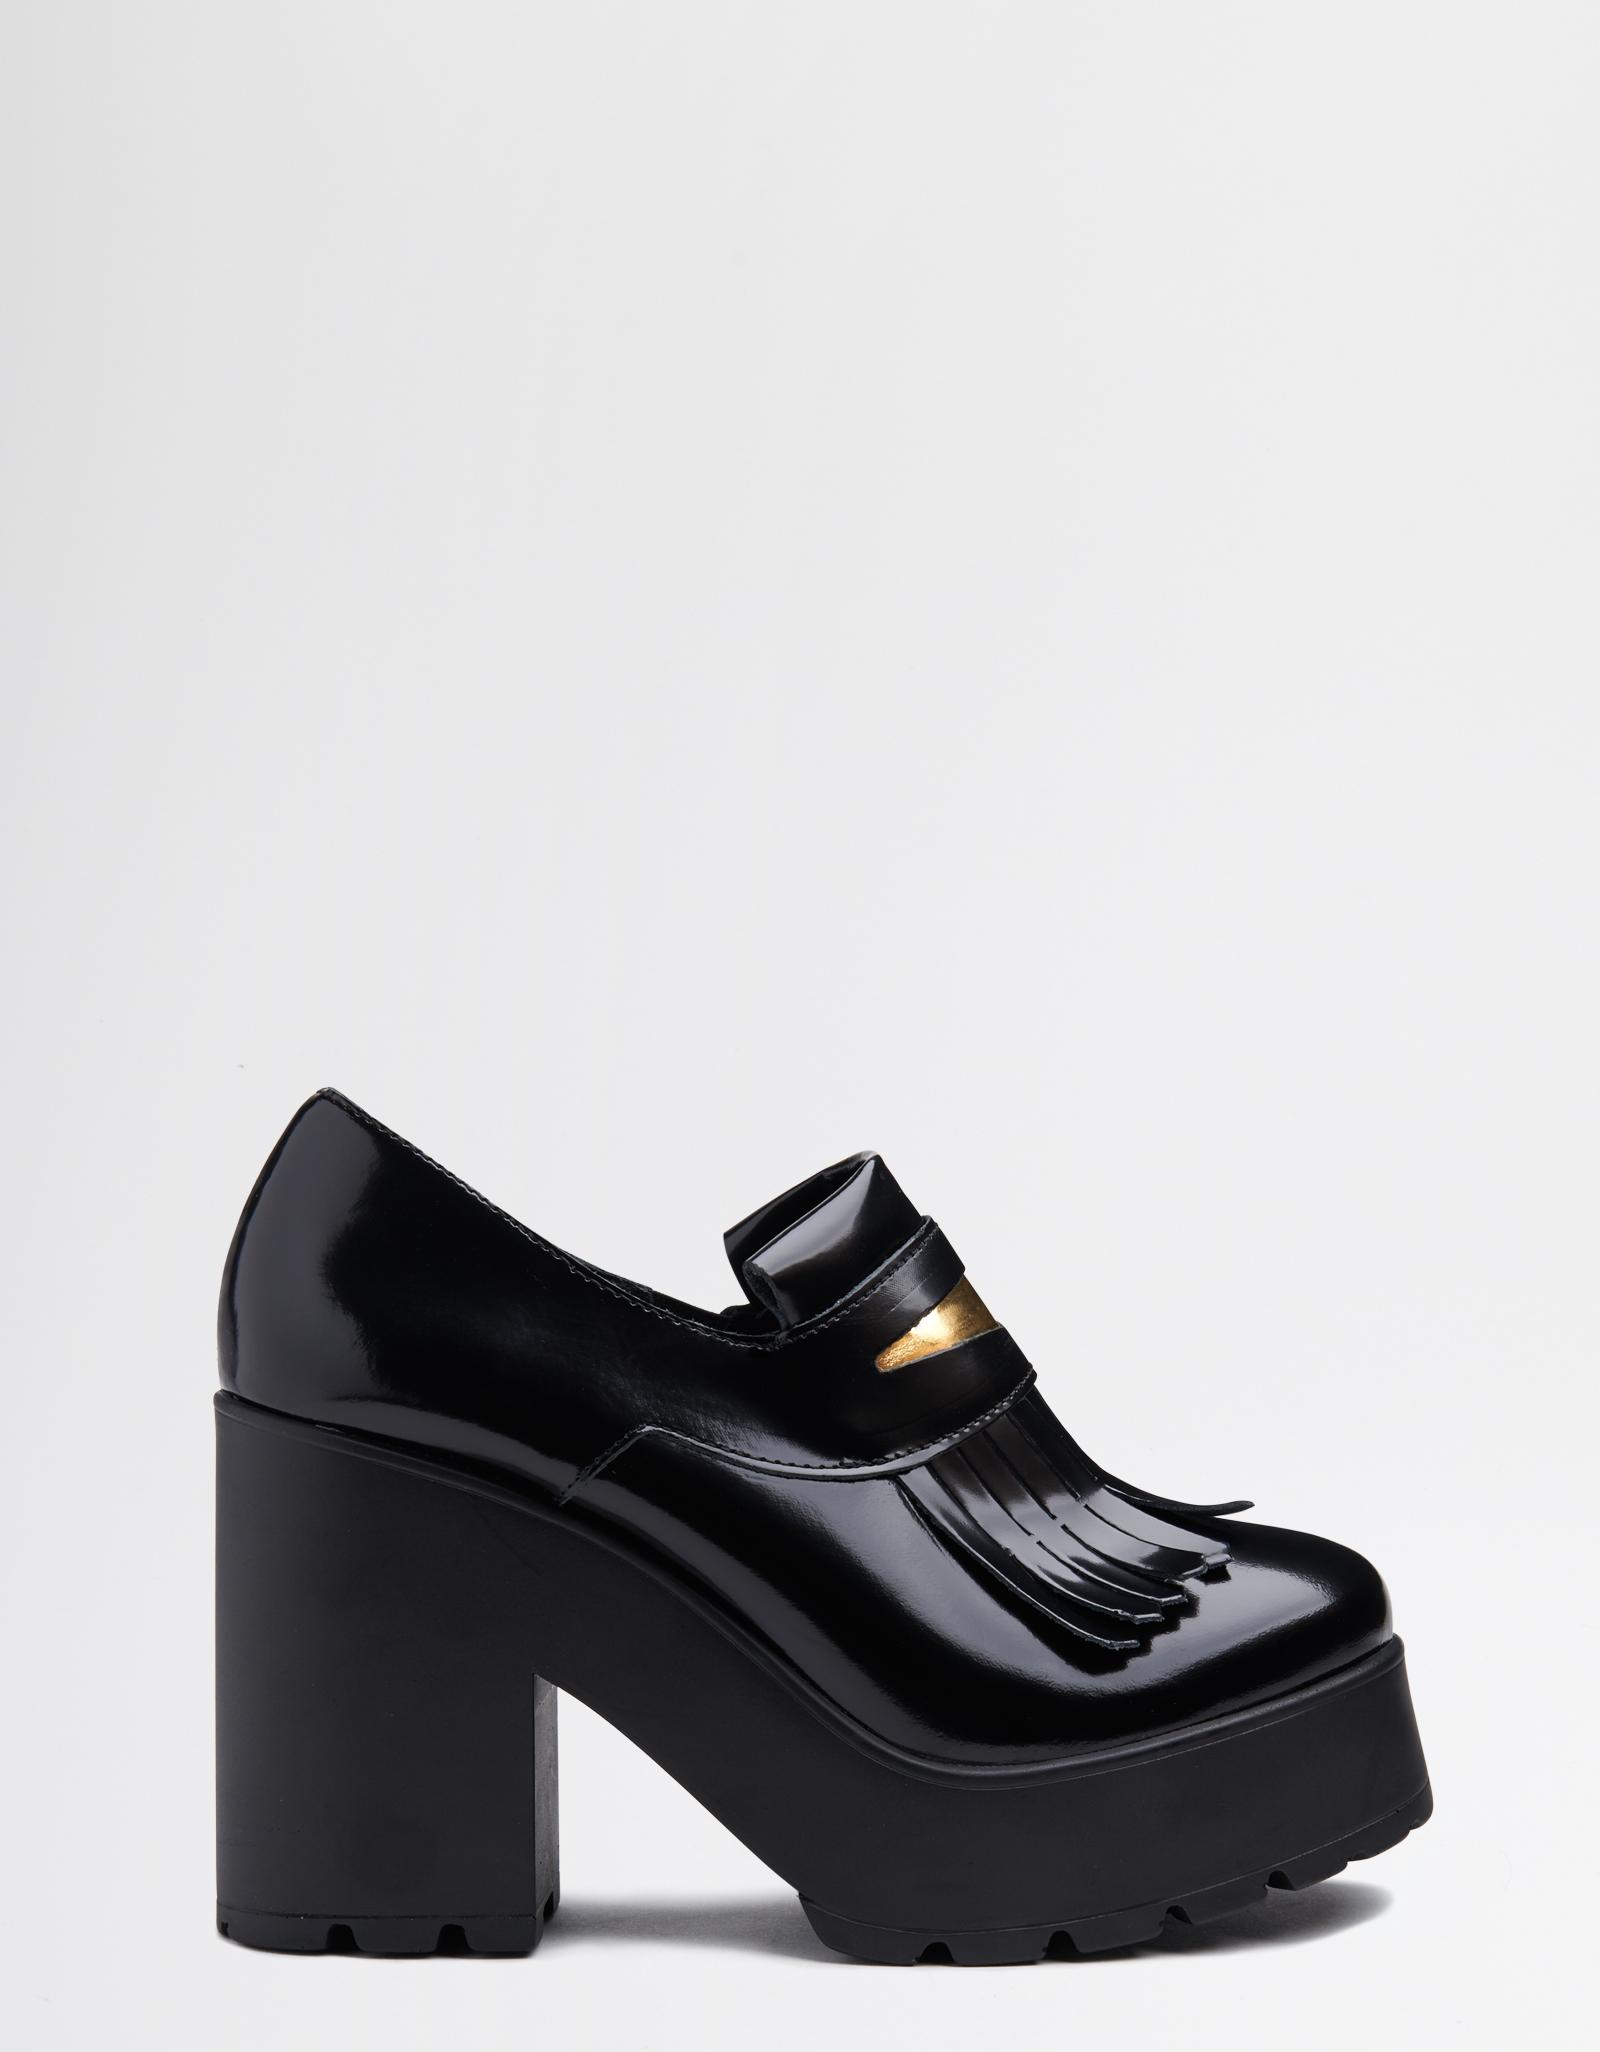 Alexia black/gold